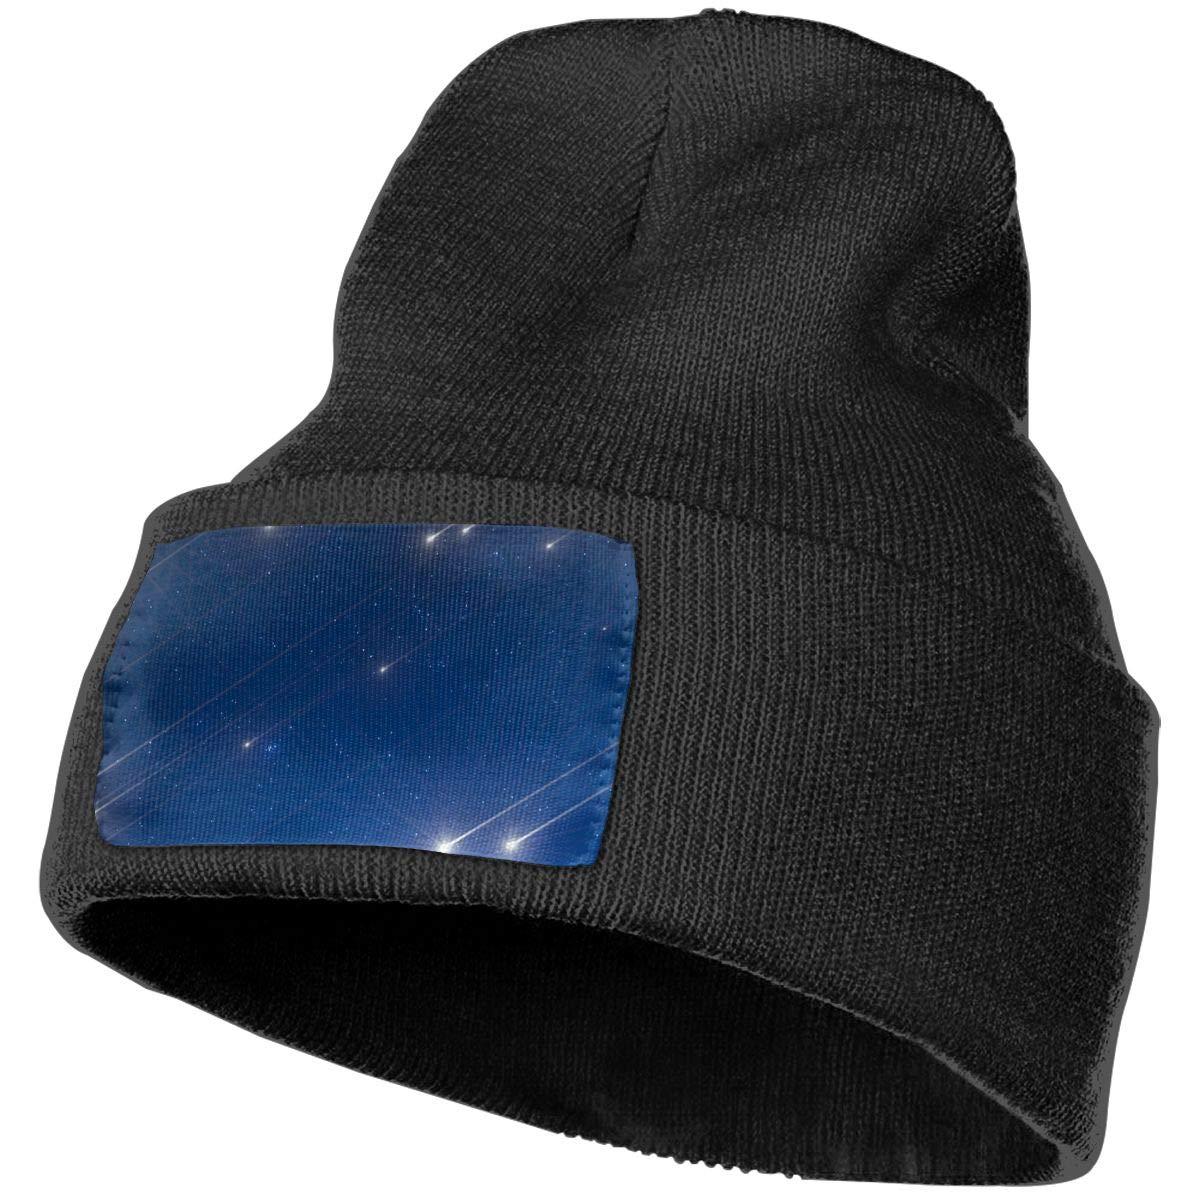 Horizon-t Meteor Shower Unisex 100/% Acrylic Knitting Hat Cap Fashion Beanie Hat